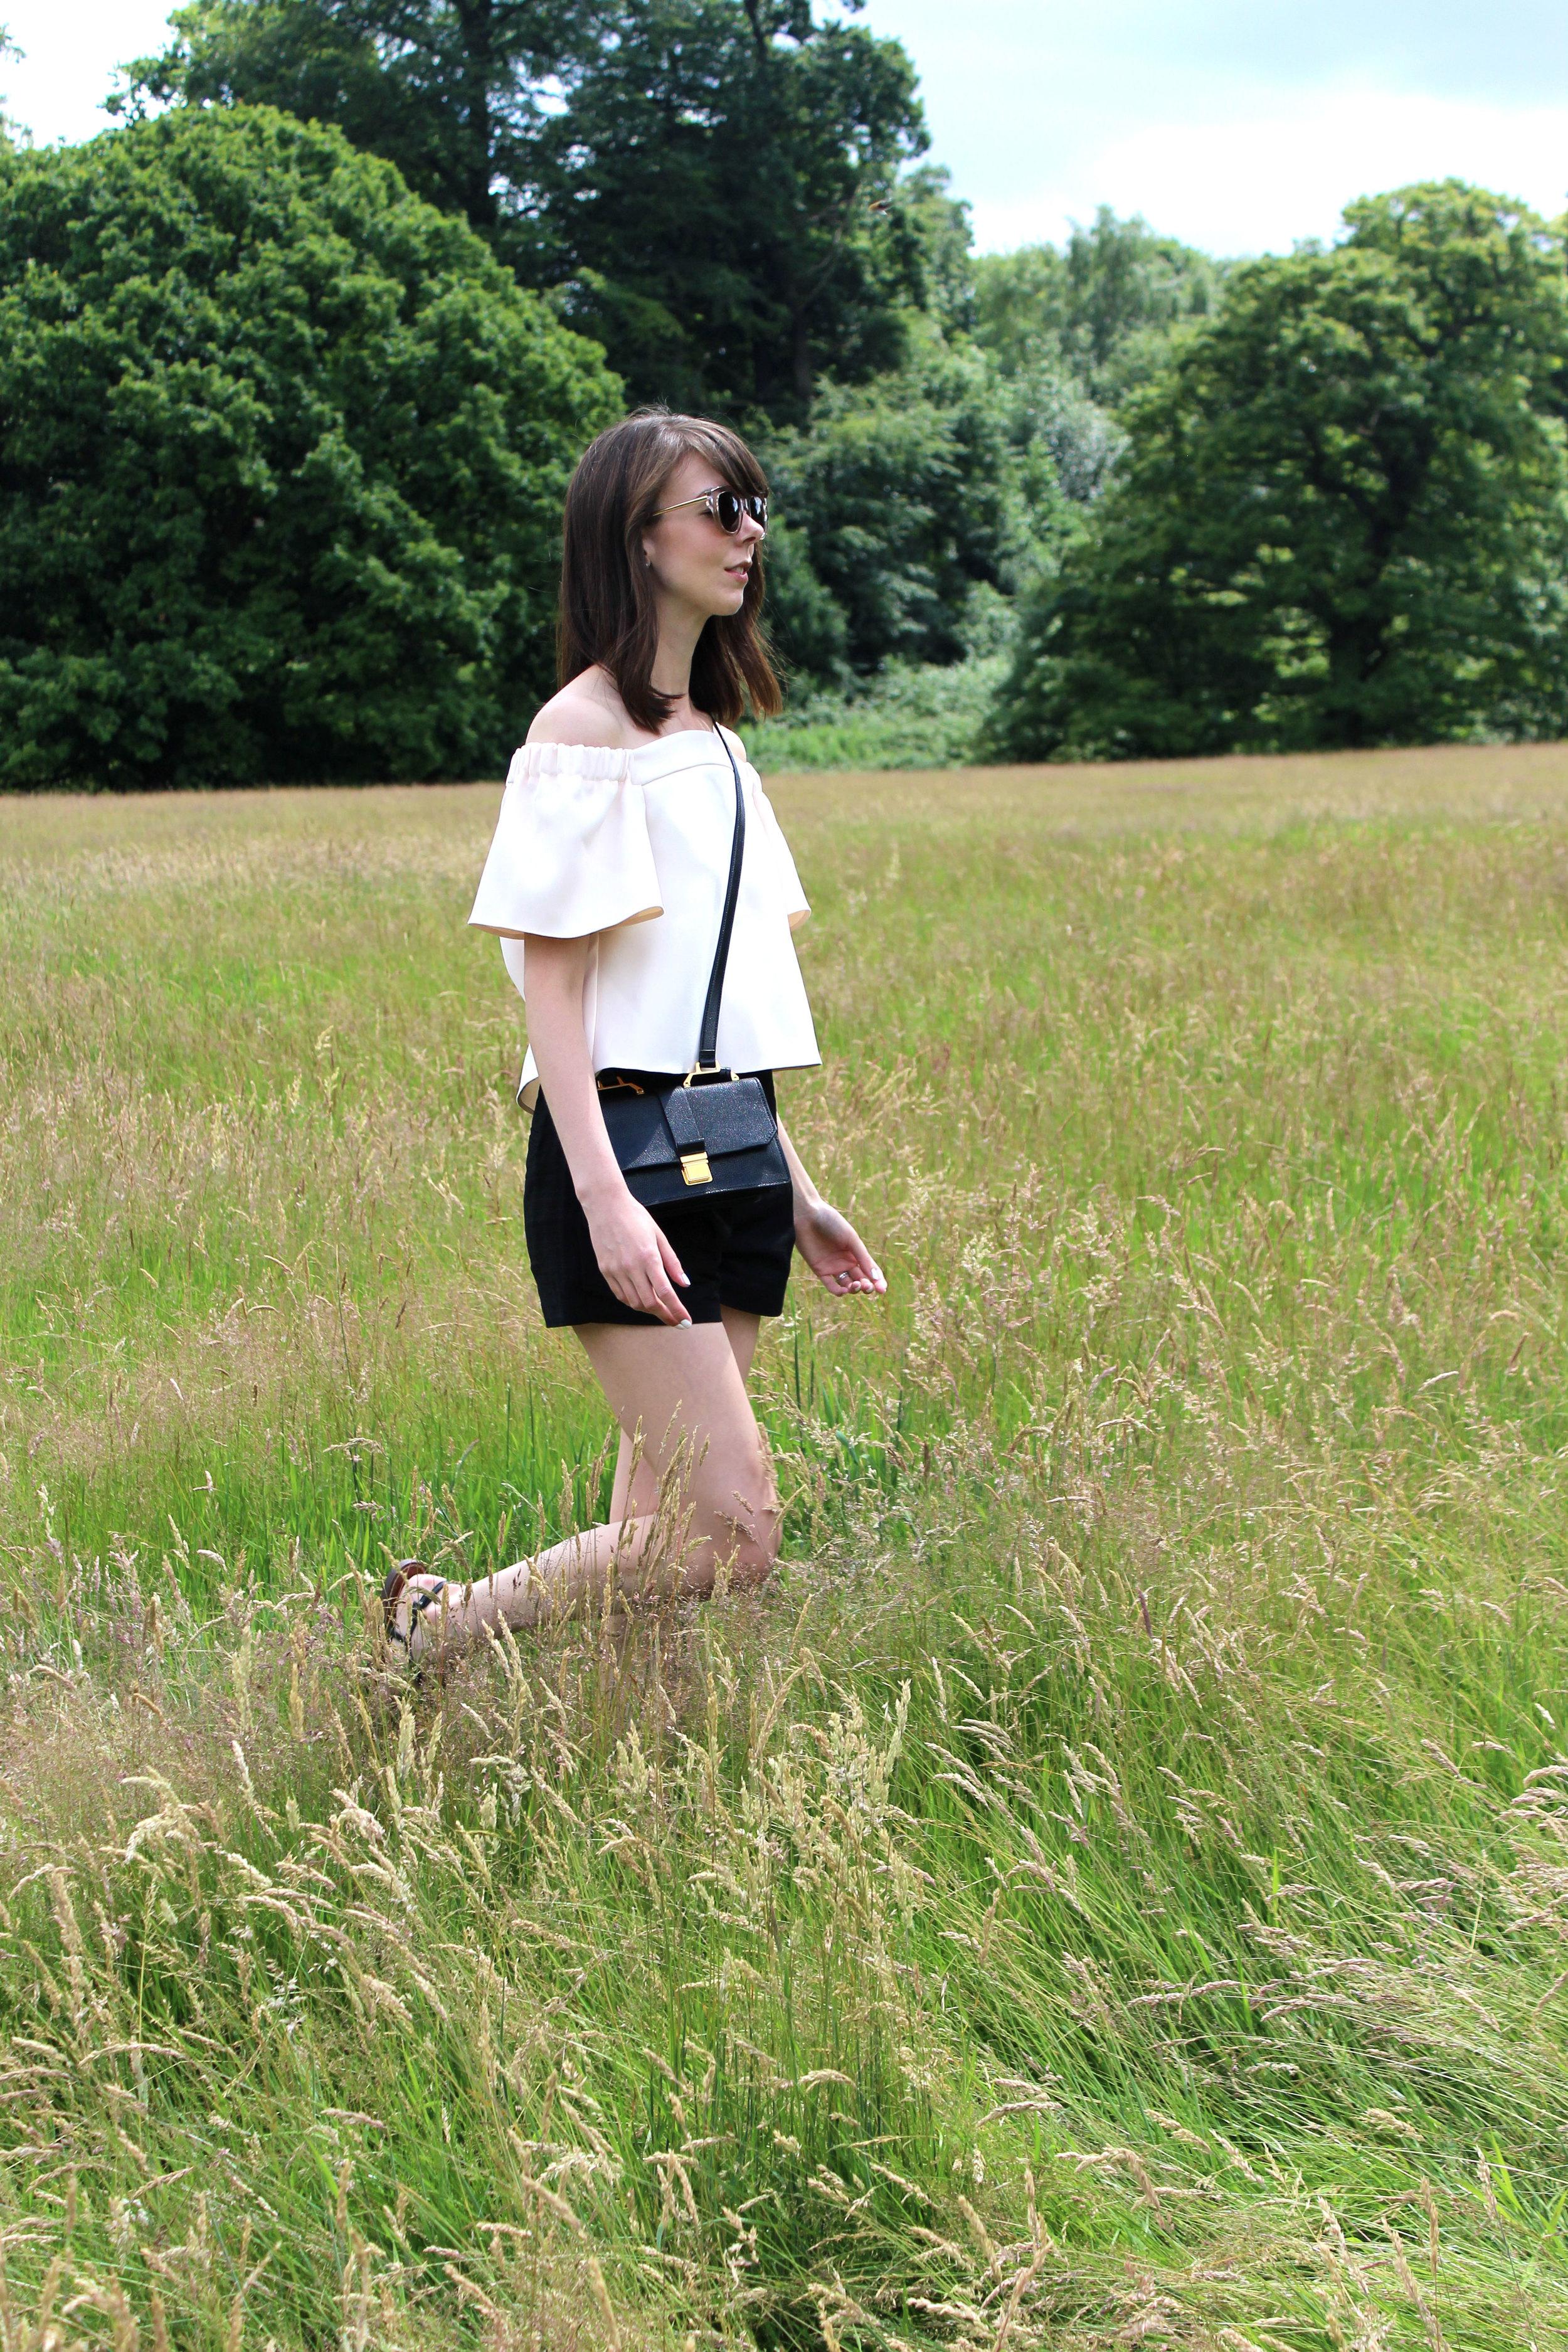 Wandering through Hampstead Heath park in London.